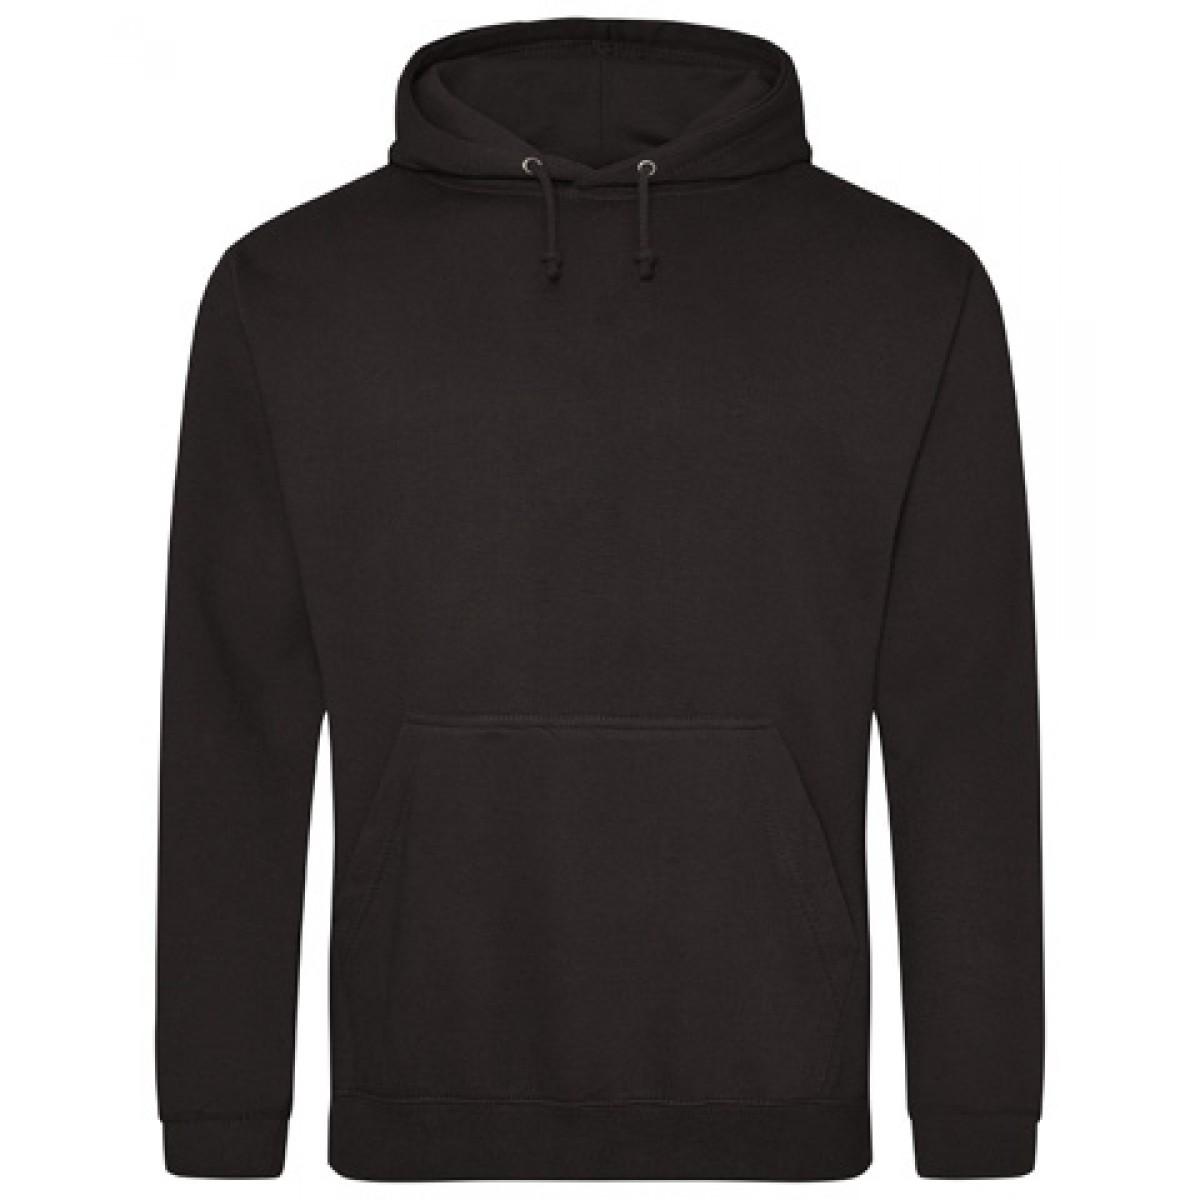 Hooded Sweatshirt 50/50 Heavy Blend-Black-M